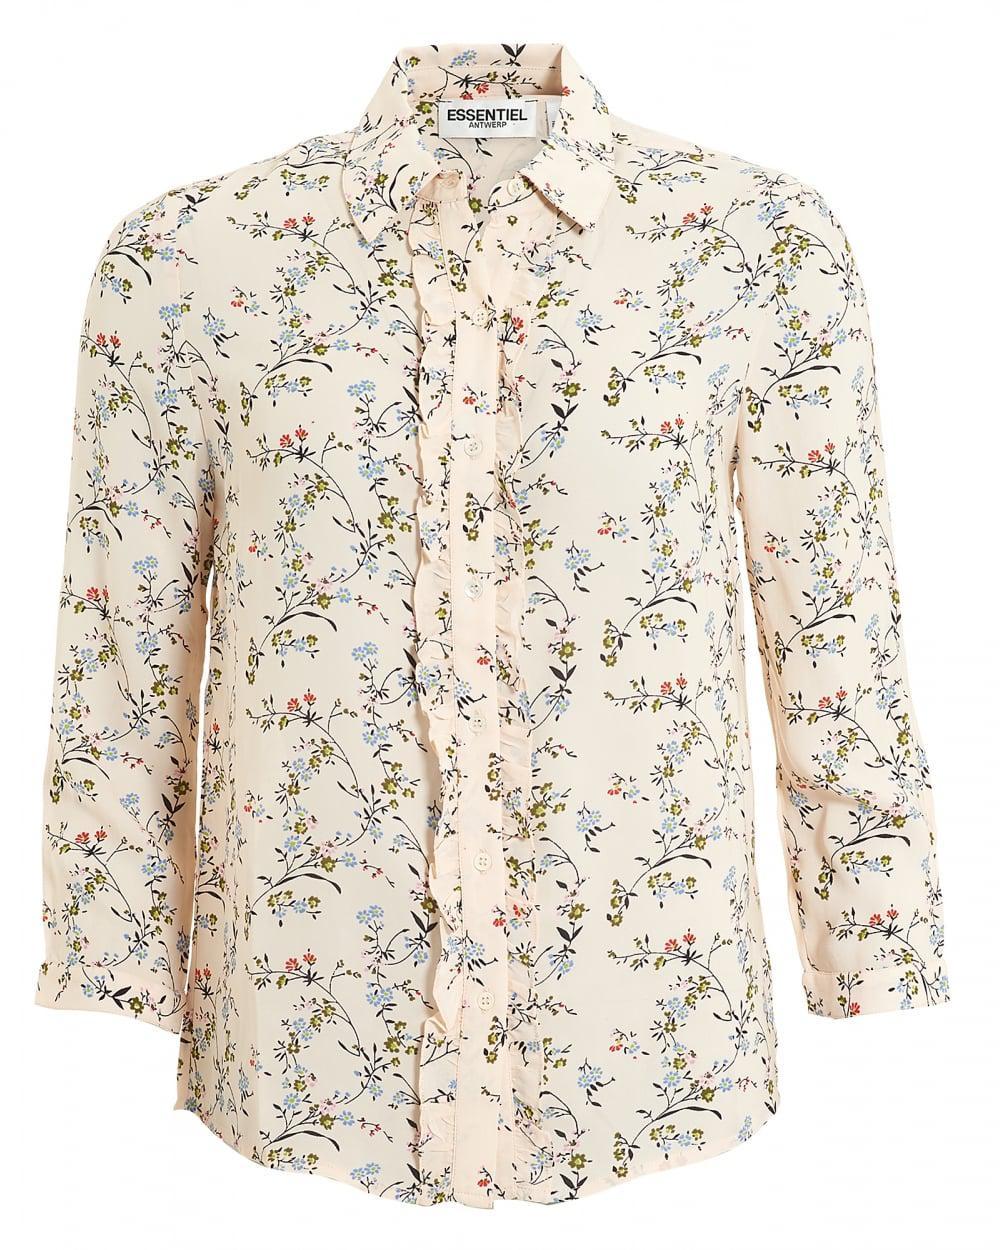 f20cf63dc9de Essentiel Antwerp Pia Blouse, 3/4 Sleeve Ruffle Pink Floral Shirt in ...